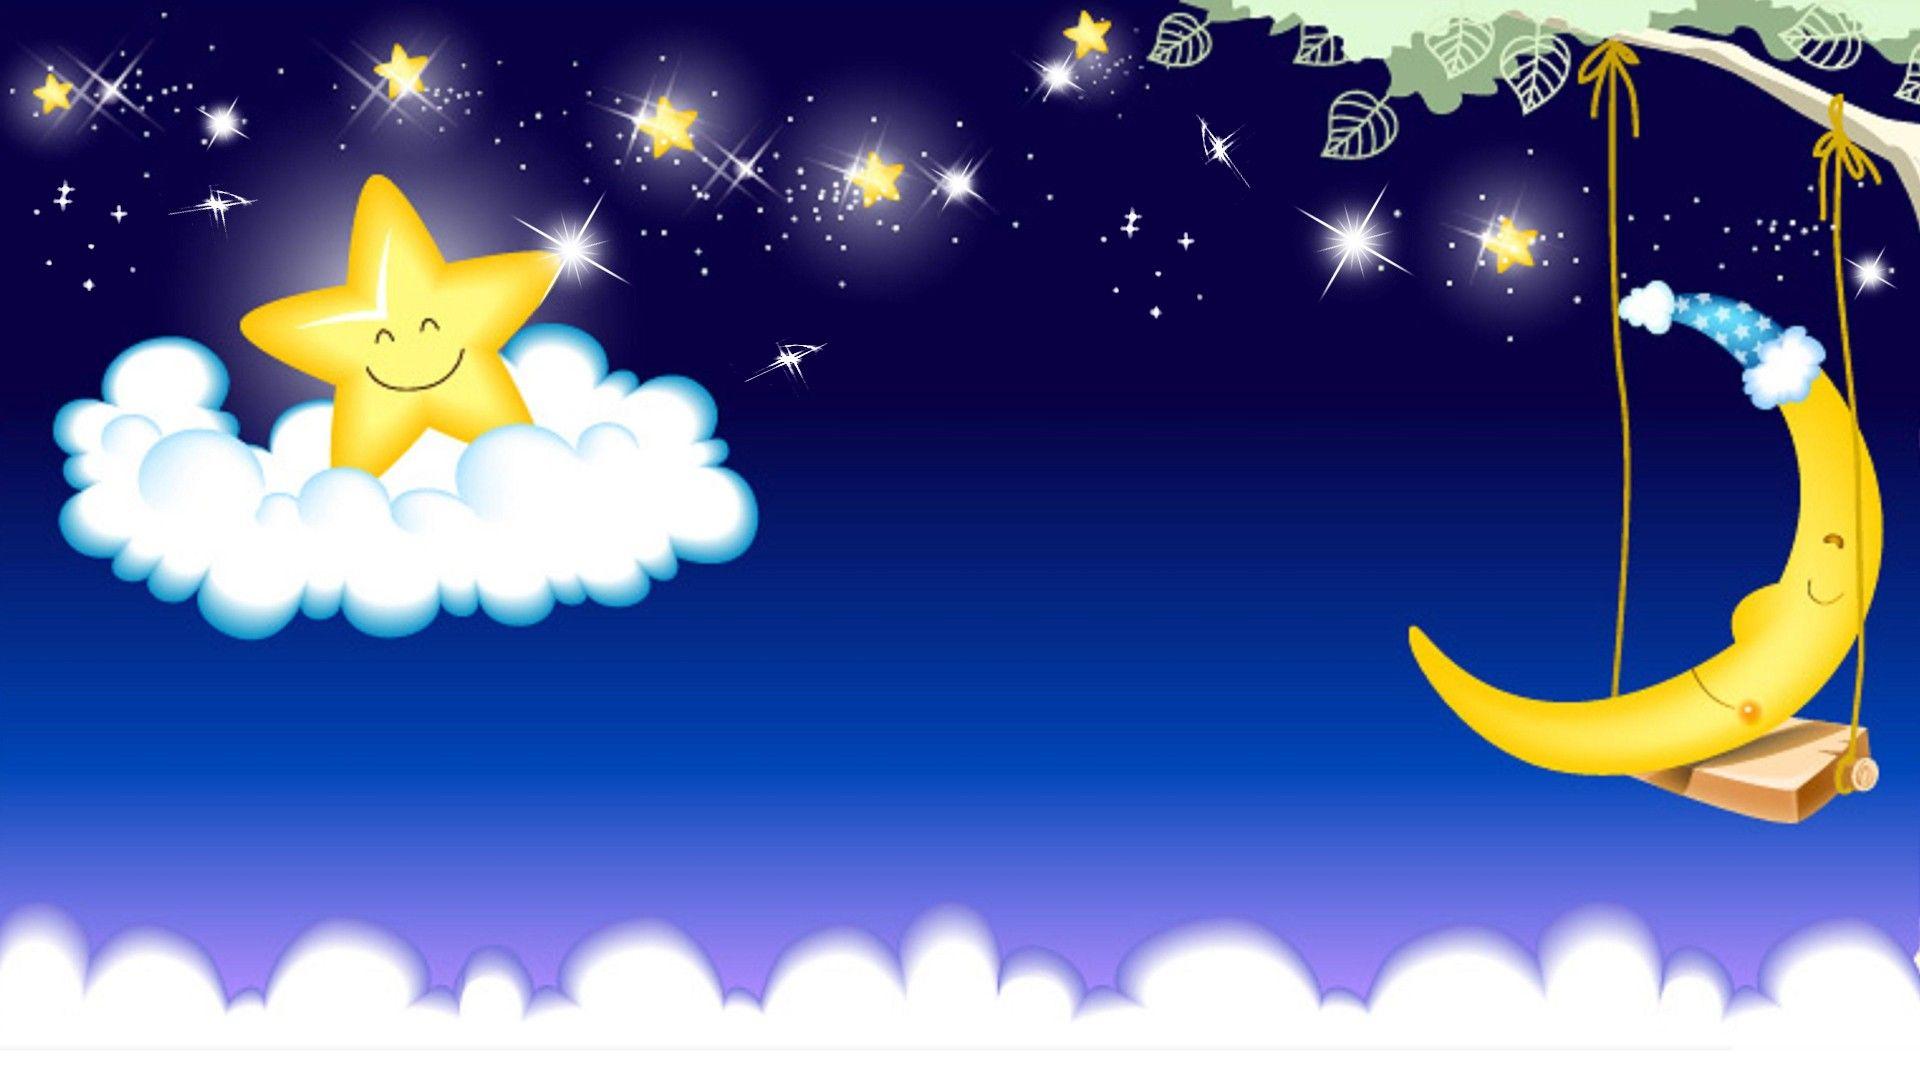 Cartoon Stars In The Sky Cartoon Children Clouds Cute Firefox Persona Sky Stars Trees Good Night Moon Star Cartoon Images Stars And Moon